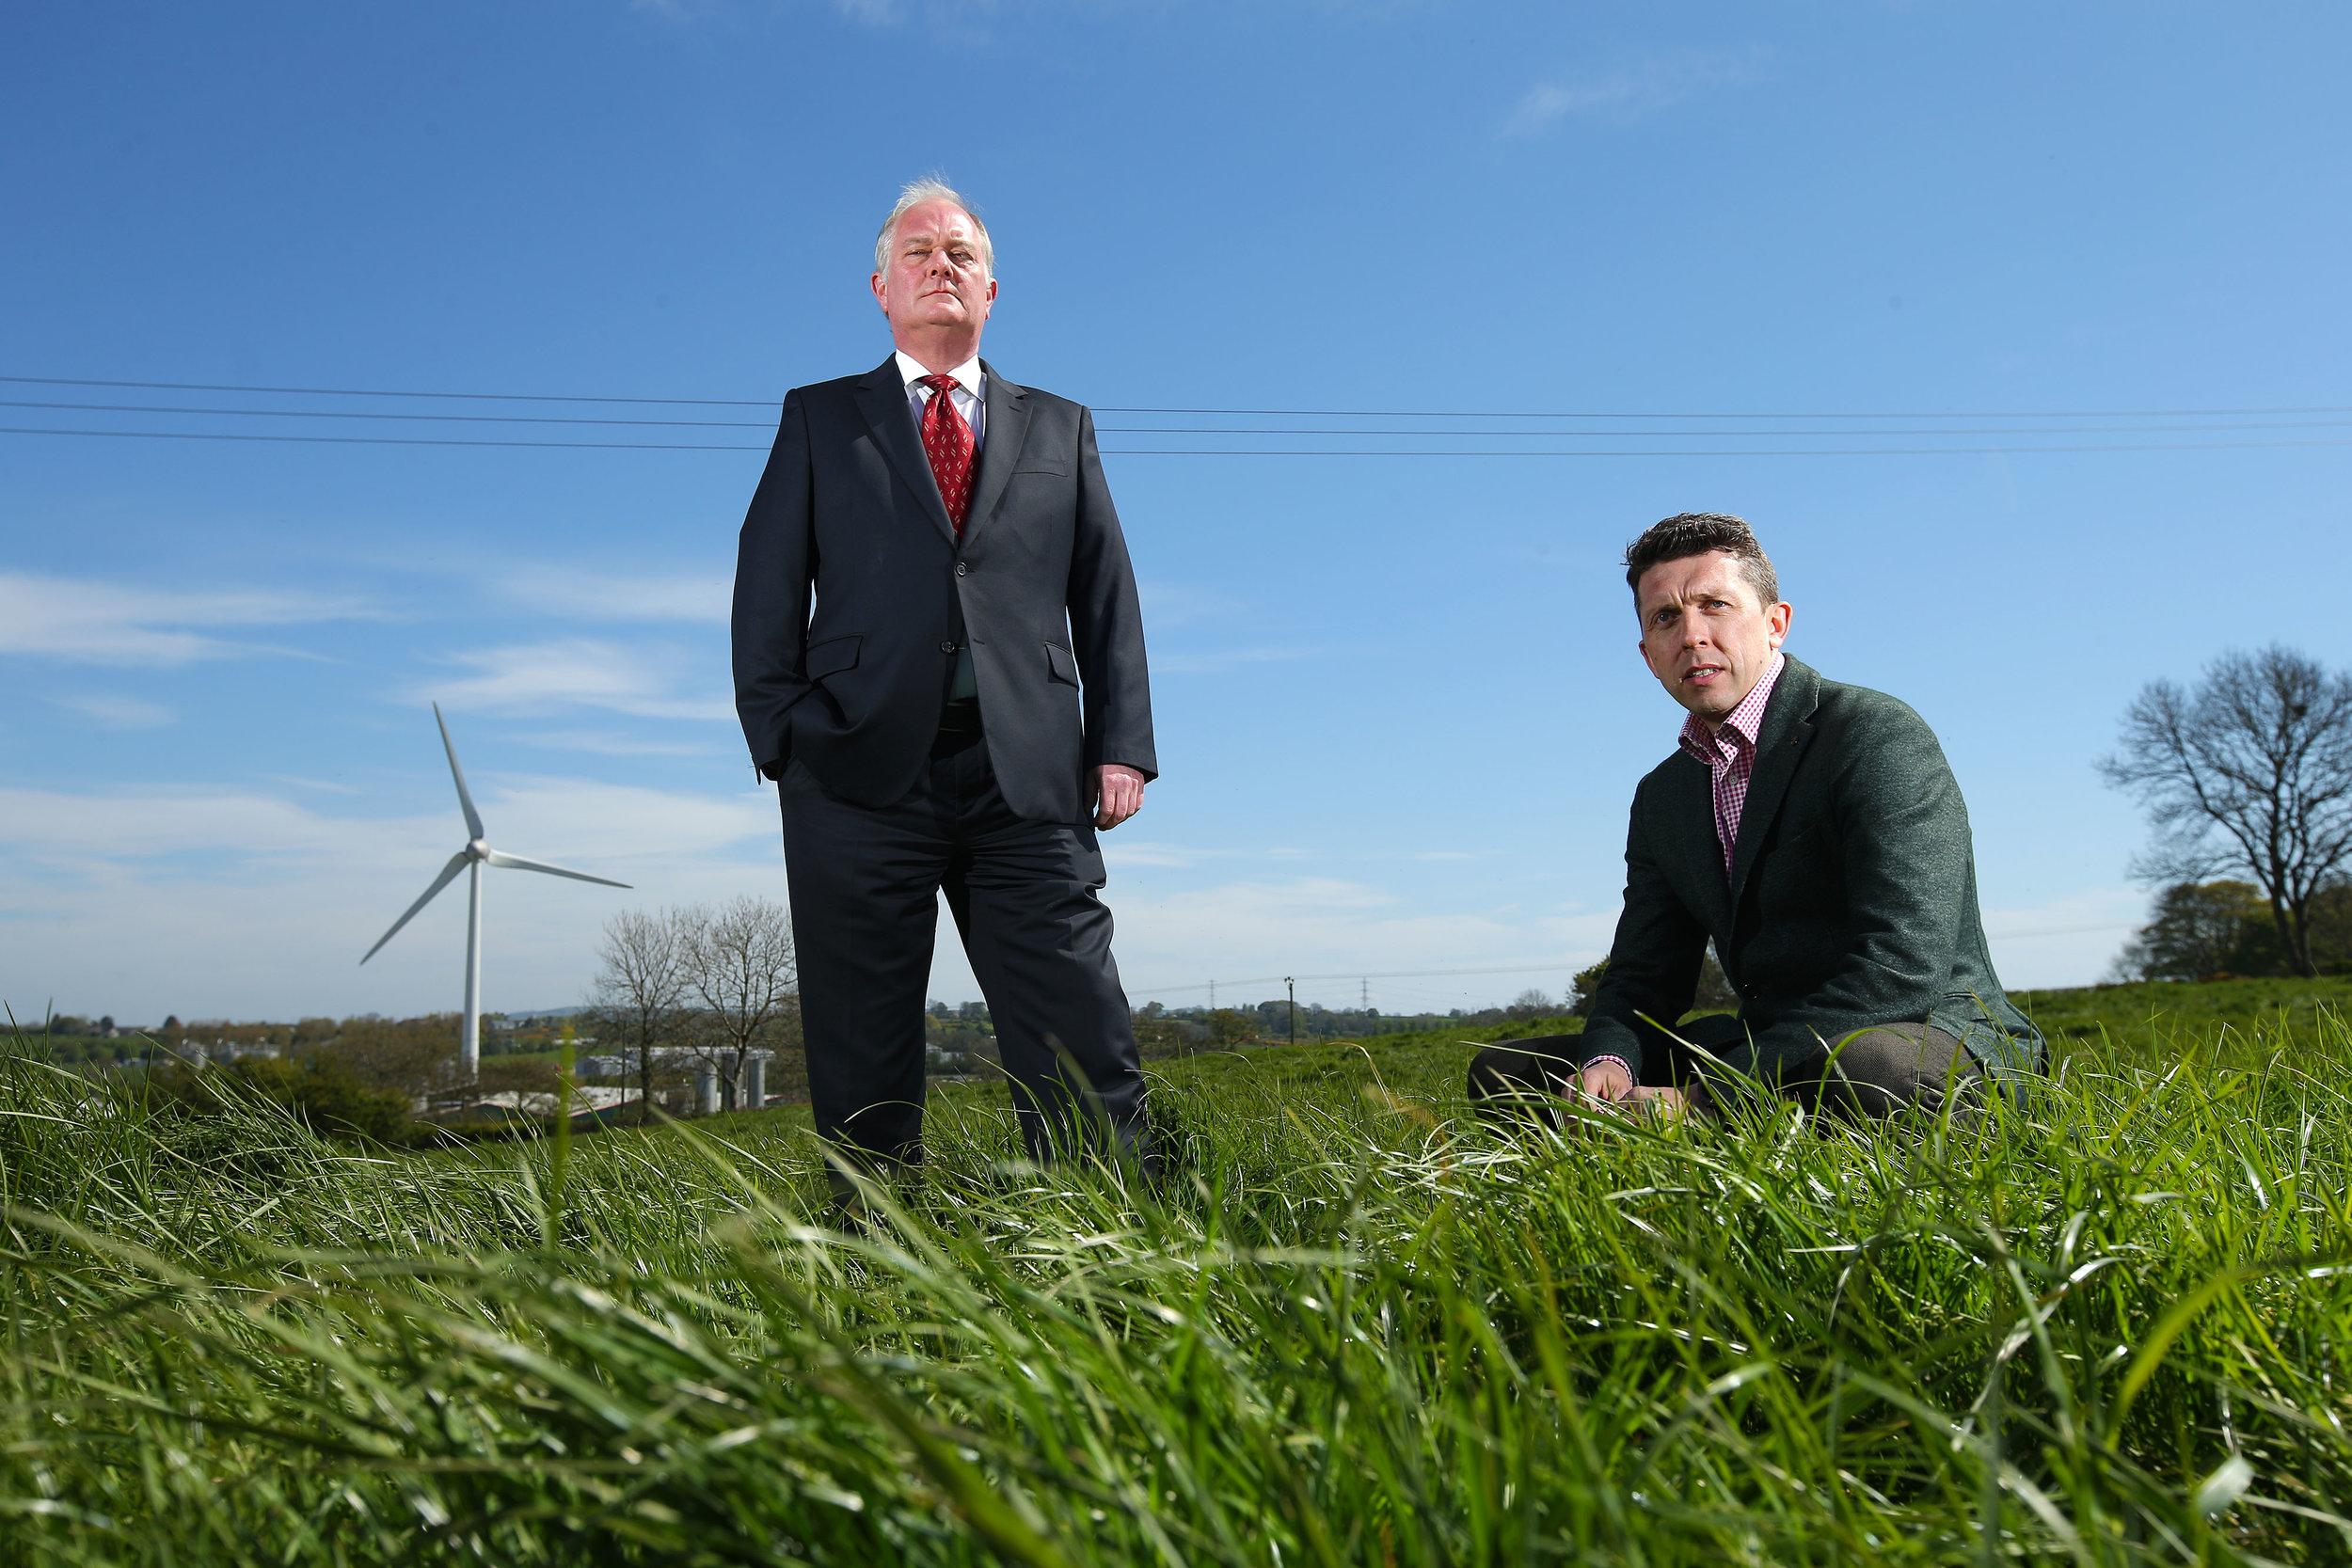 James Gibbons LLB & Conor Devine MRICS of Clearpath Finance